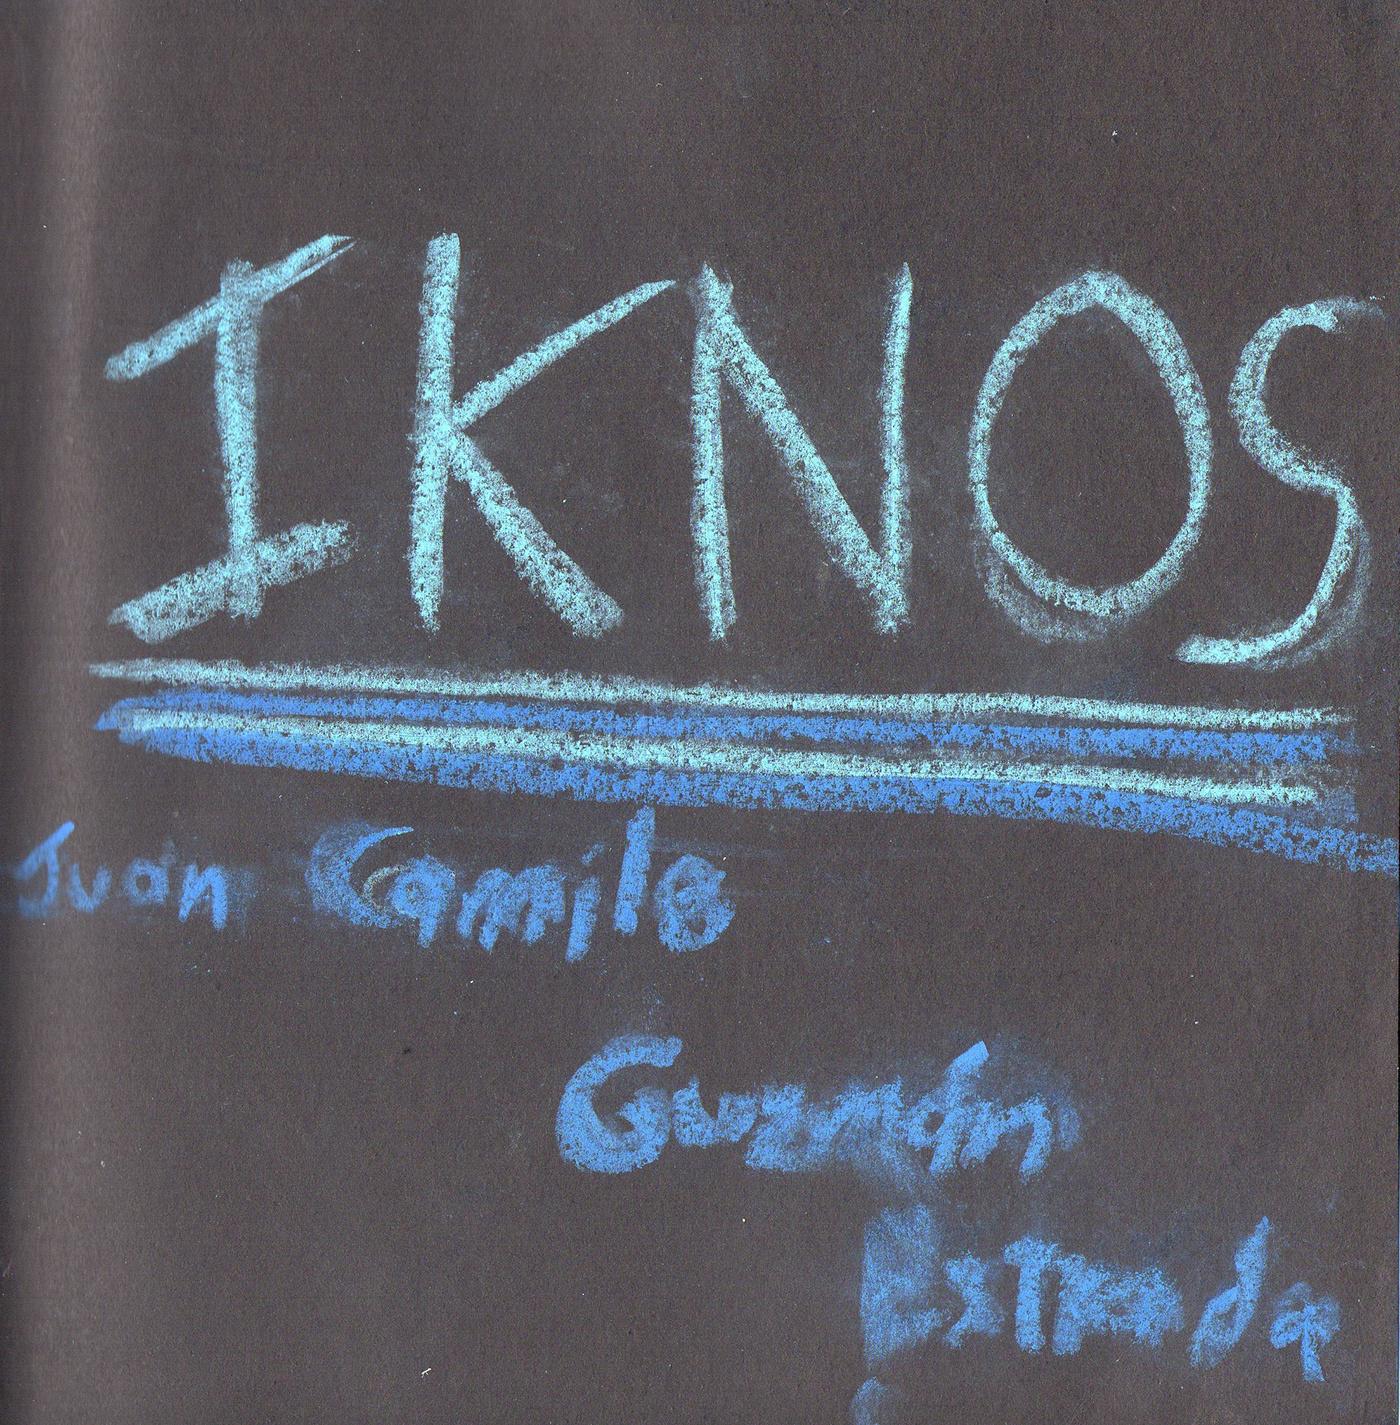 Image may contain: handwriting and blackboard